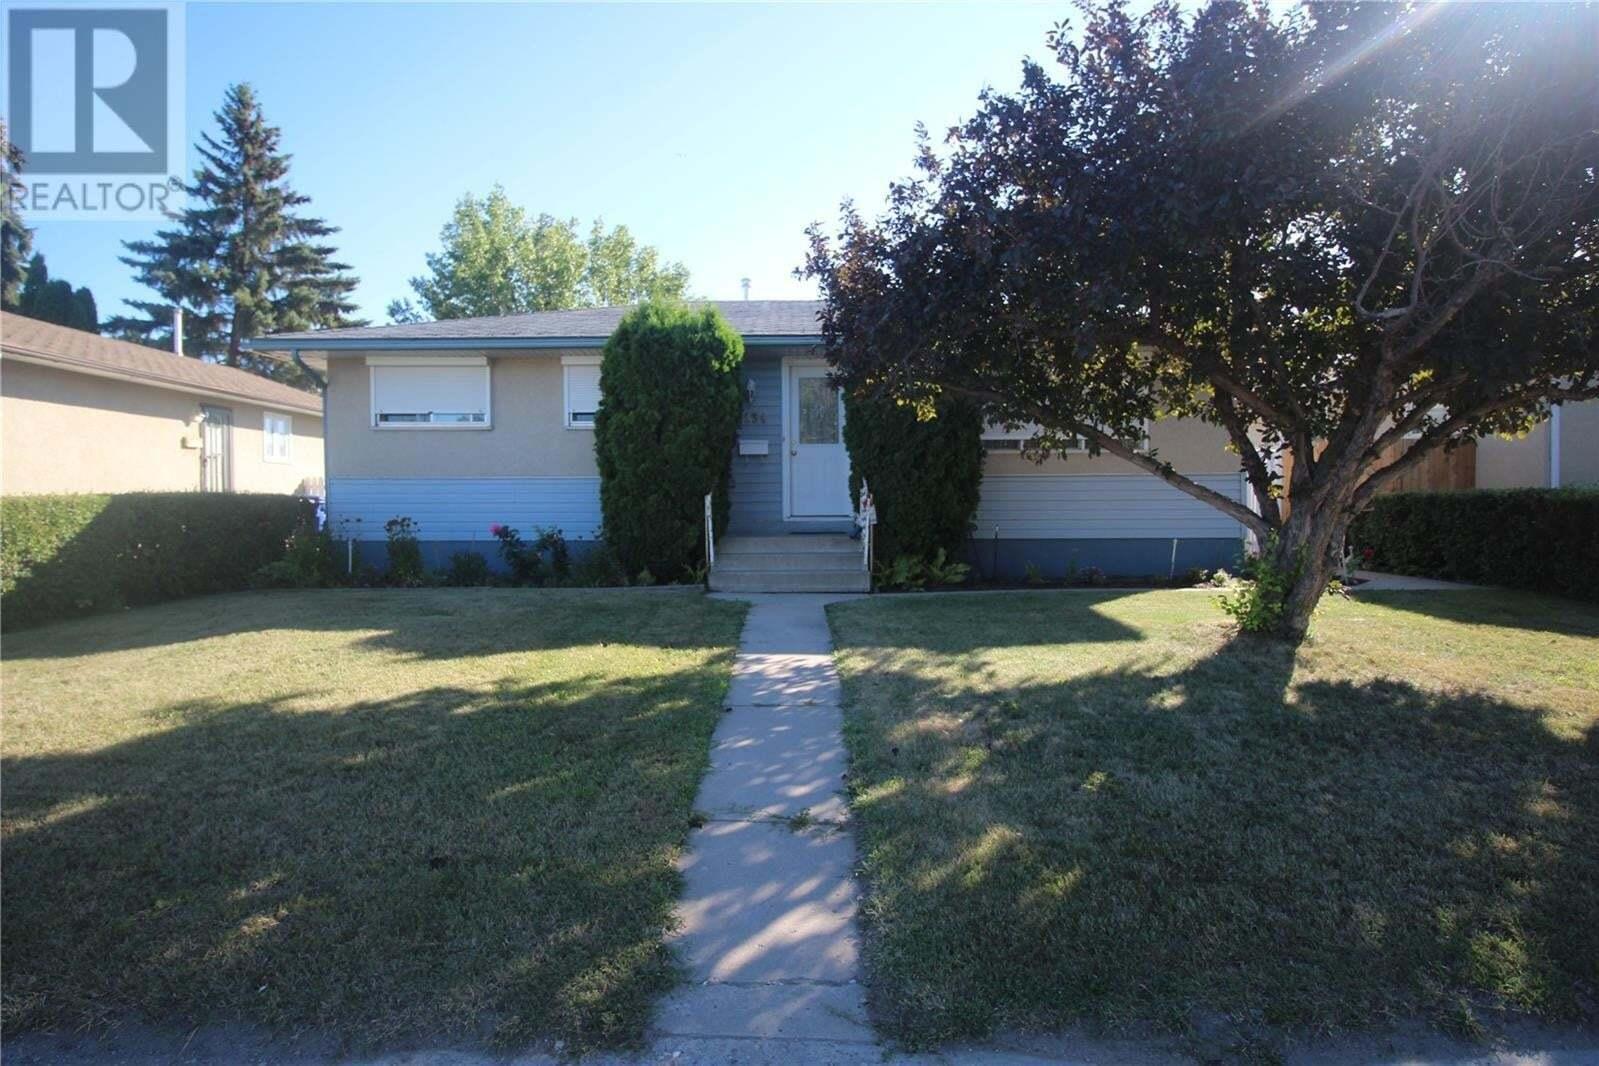 House for sale at 3334 Diefenbaker Dr Saskatoon Saskatchewan - MLS: SK826856